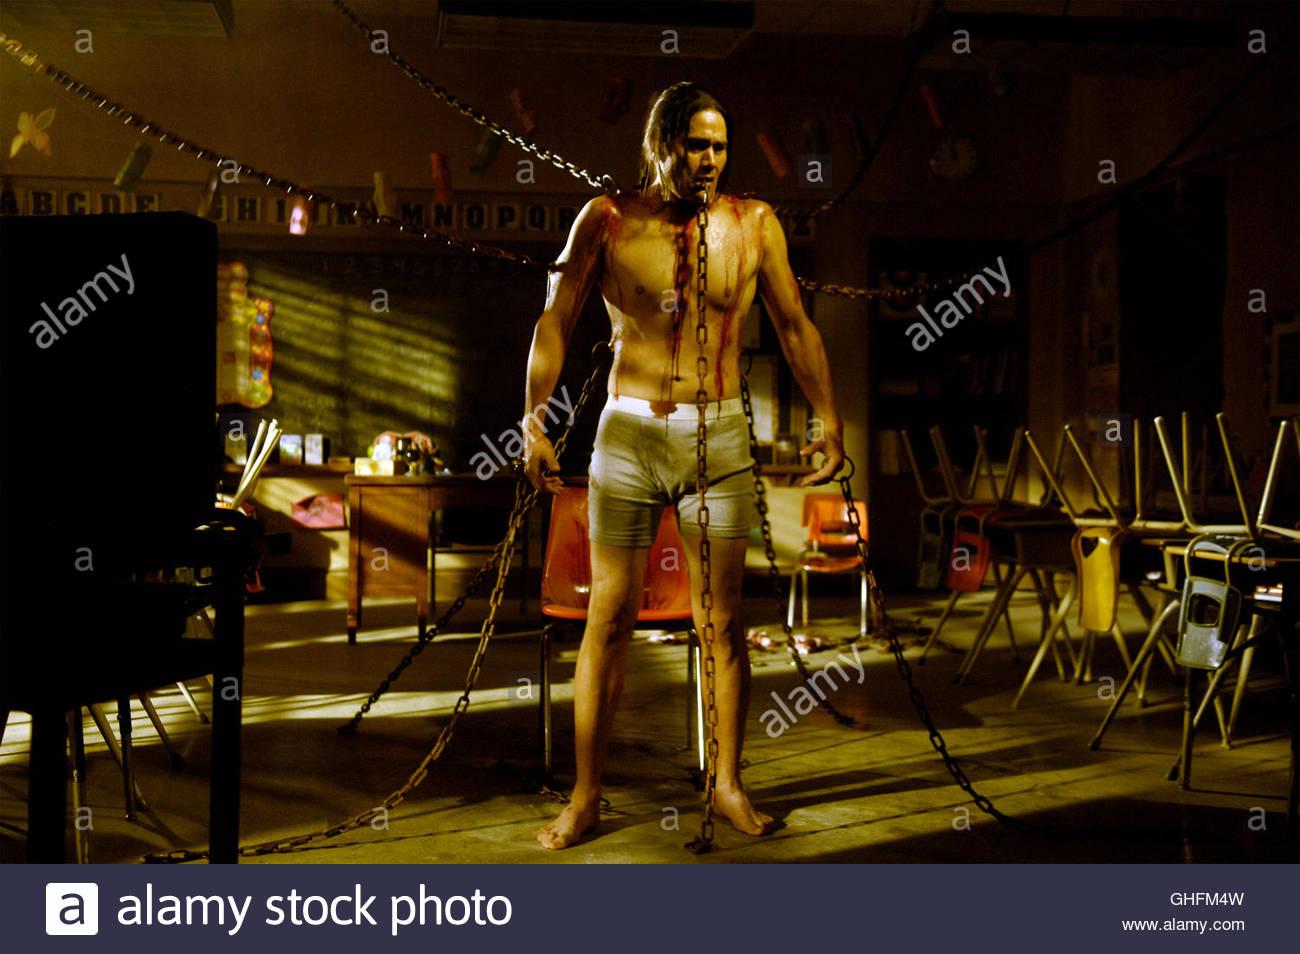 SAW III Saw III USA 2006 Saw III / Troy (J.LAROSE) Regie: Darren Lynn Bousman aka. Saw III Stock Photo